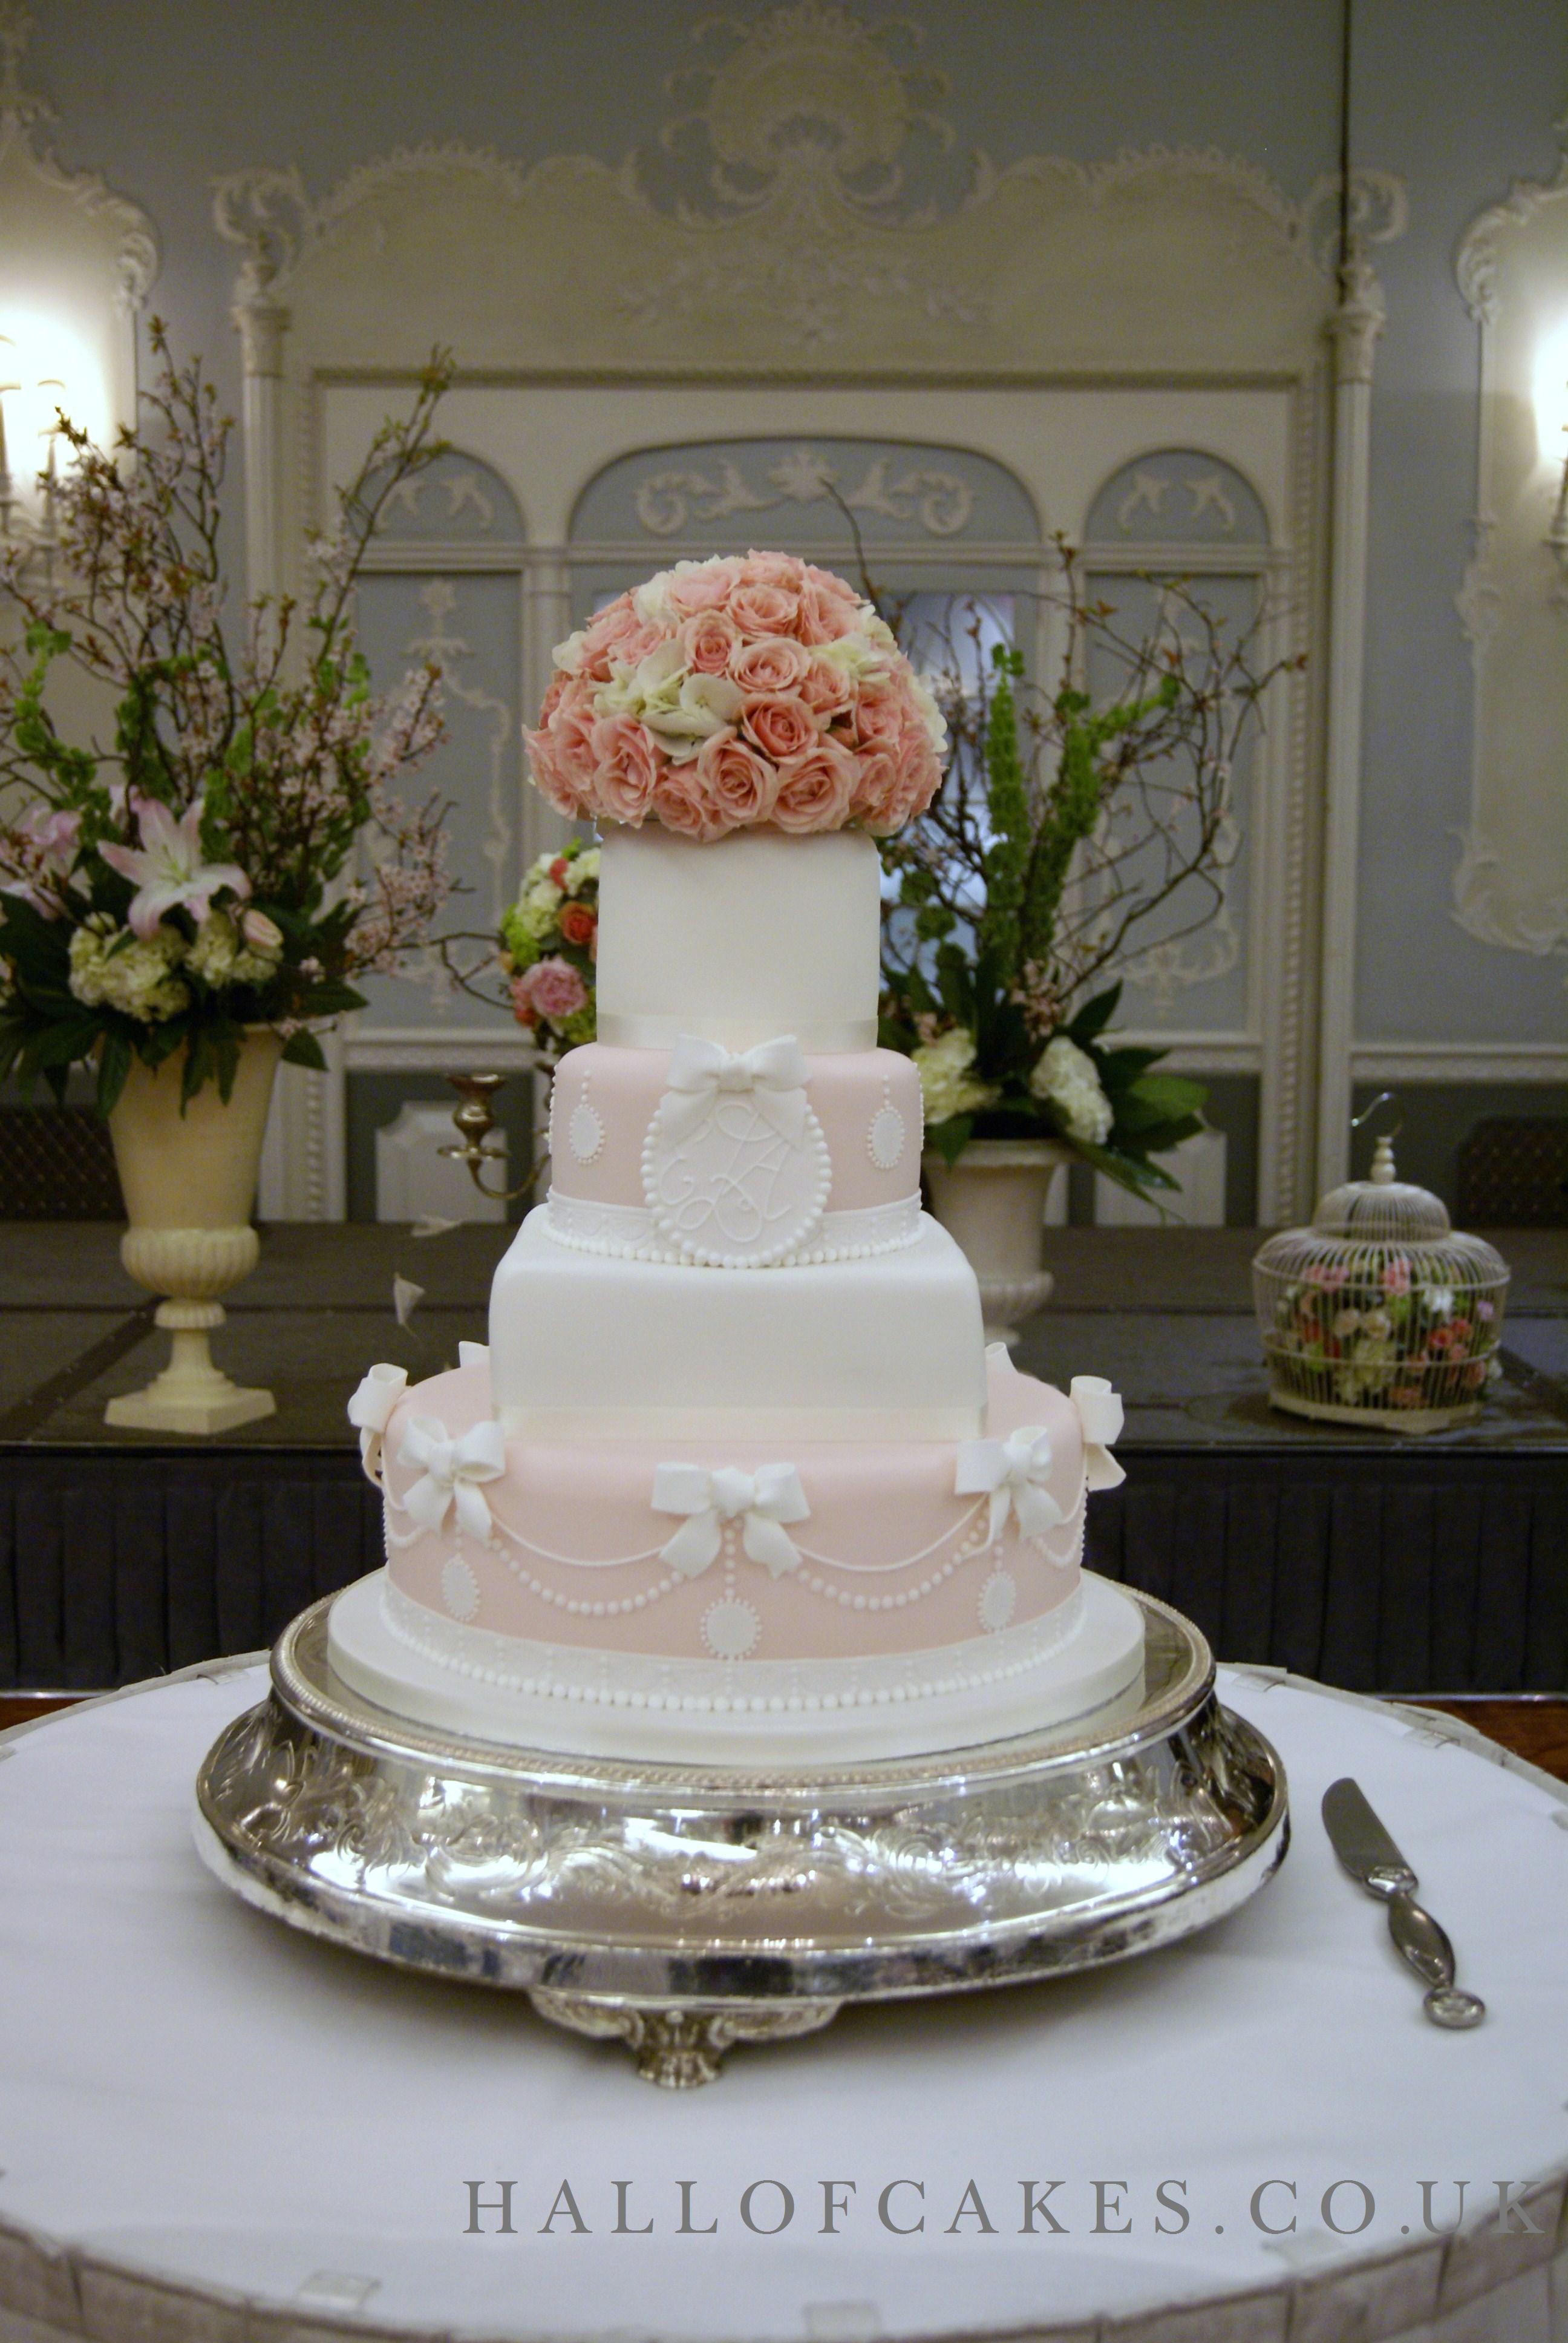 Deesigner Wedding Cakes  Luxury wedding cakes by cake designer Nicola Hall part of